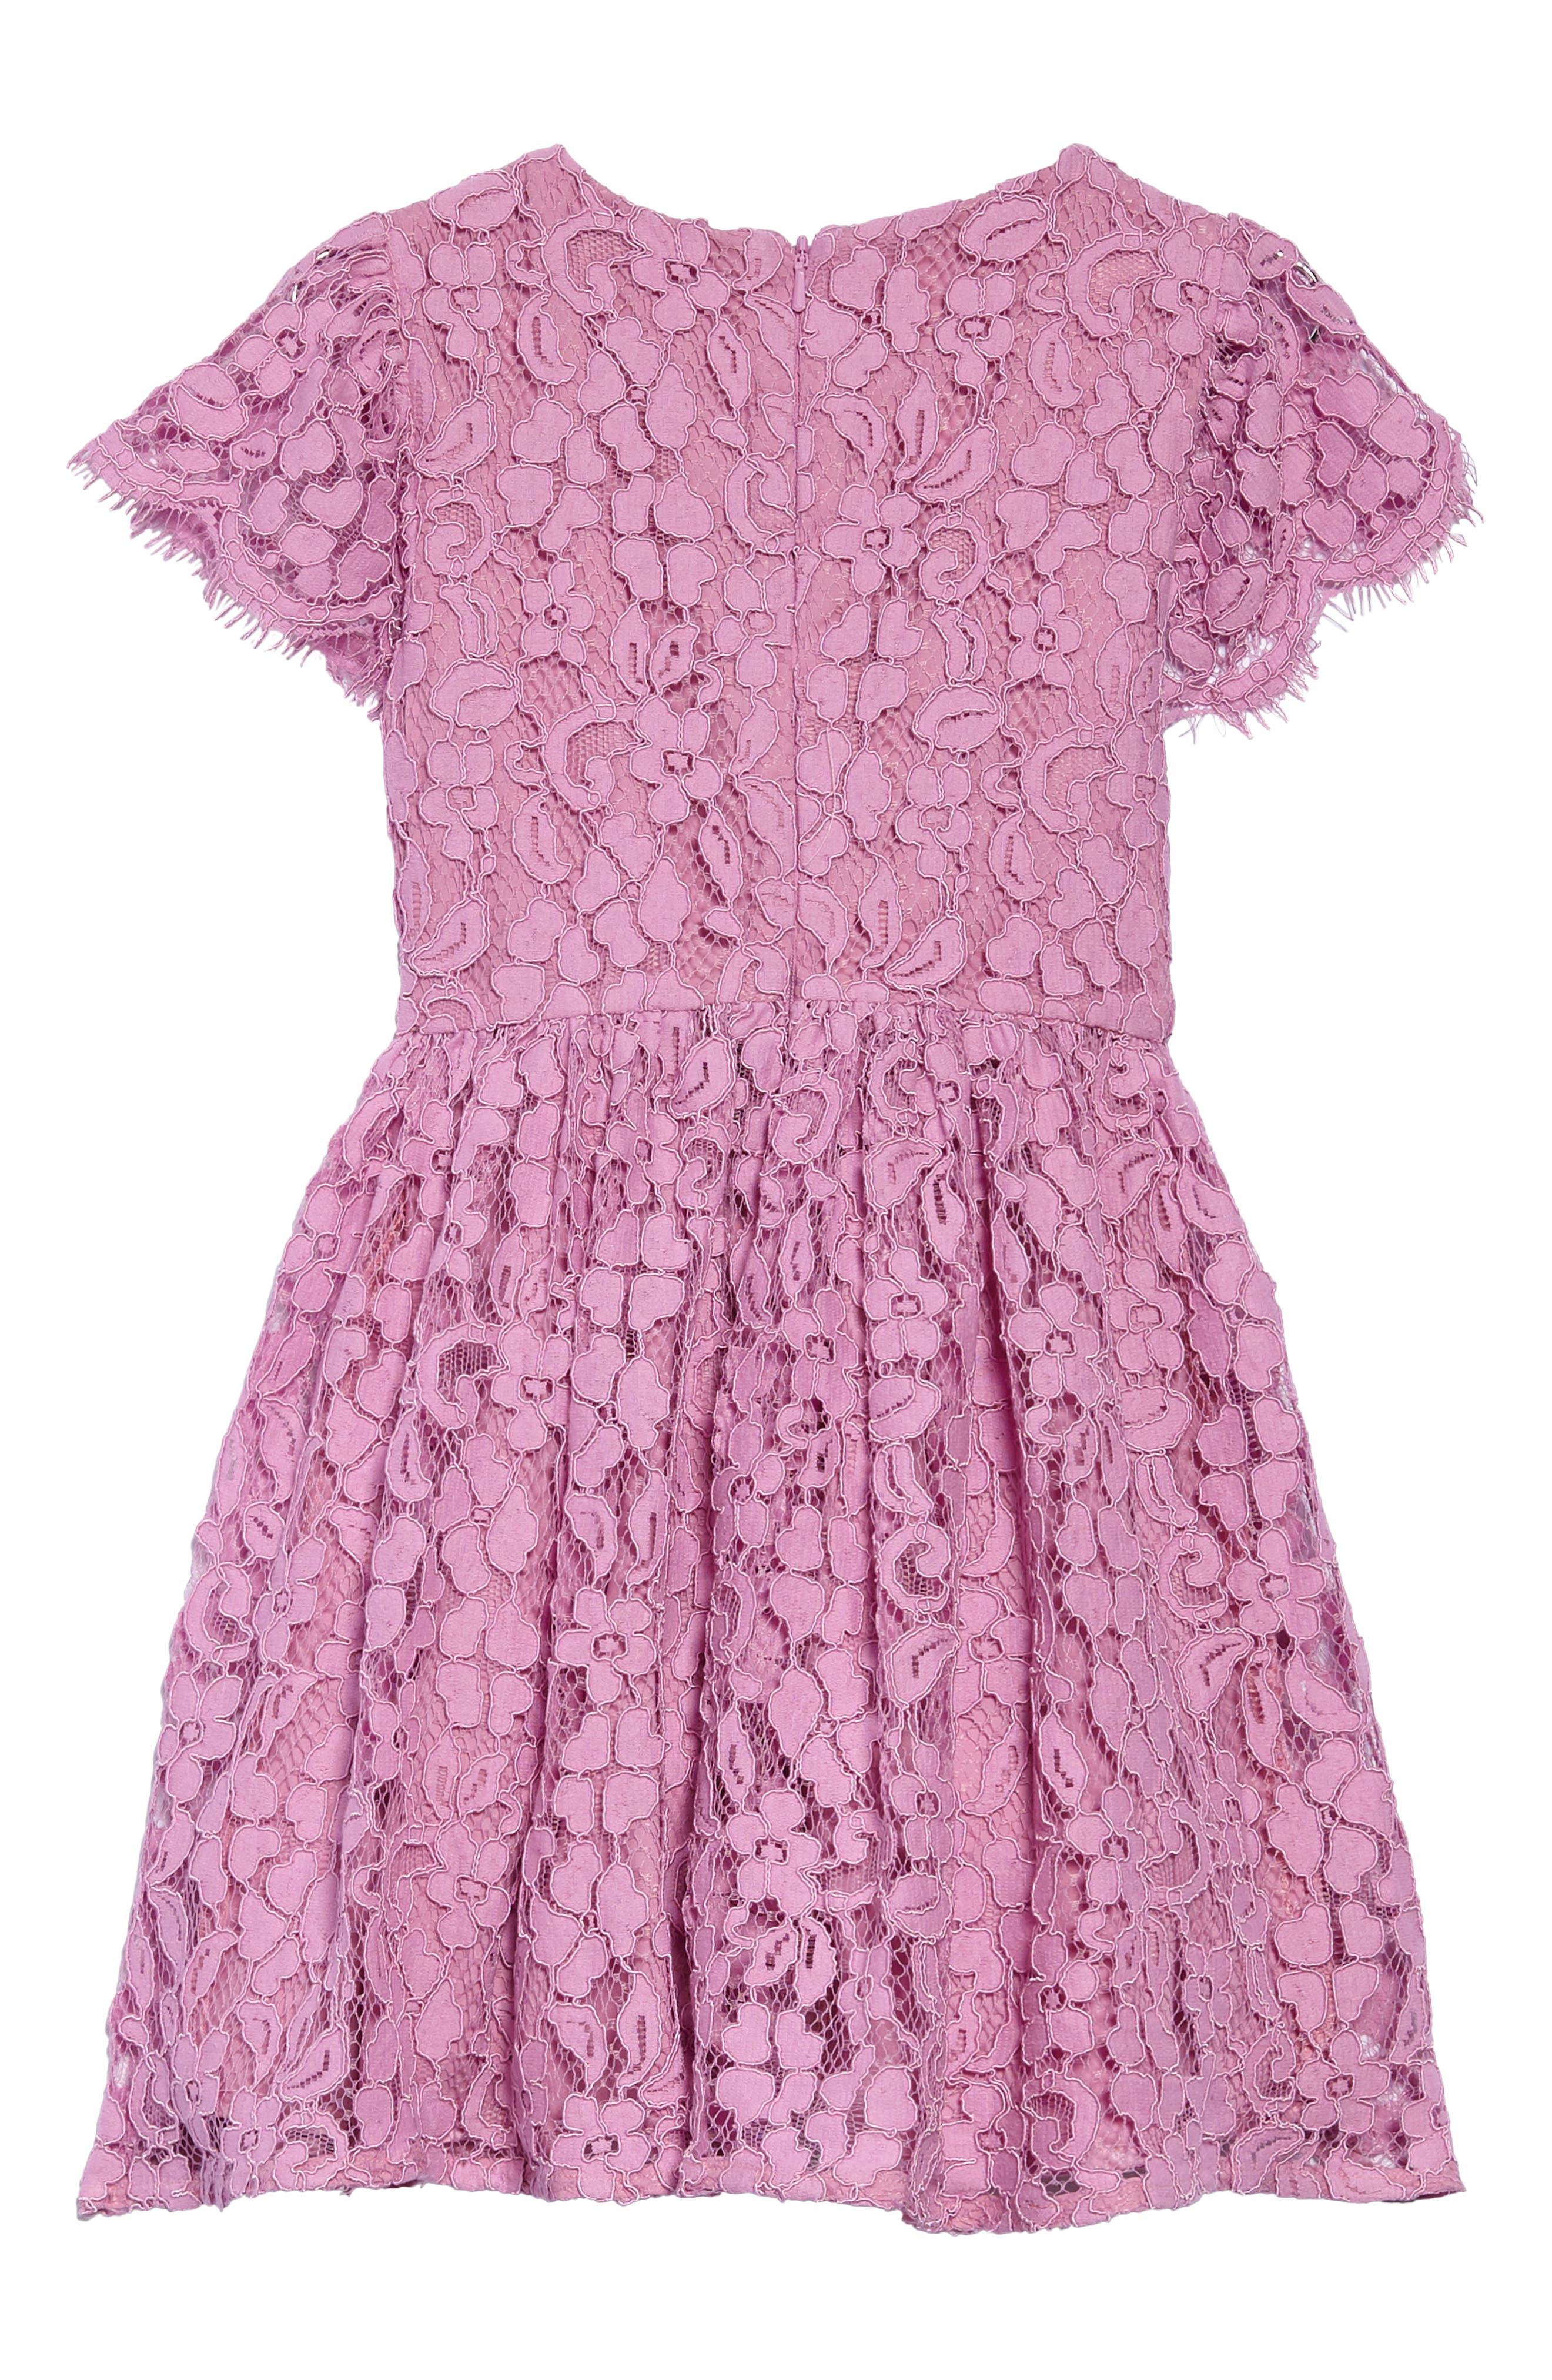 Sienna Floral Lace Dress,                             Alternate thumbnail 2, color,                             650